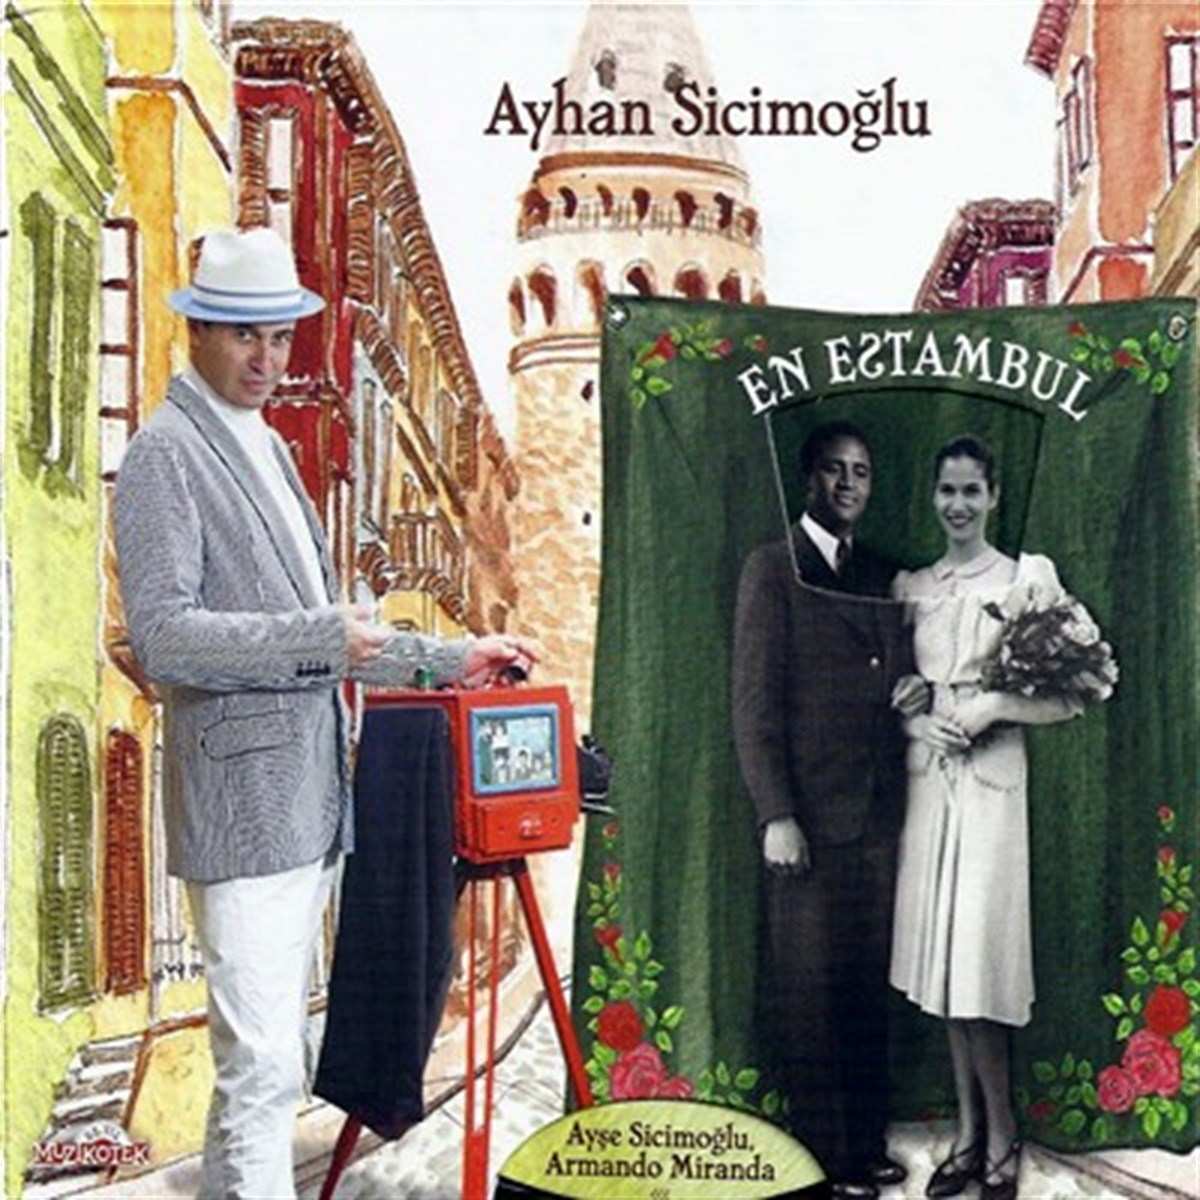 Ayhan-Sicimoglu---En-Estambul-3fab.jpg